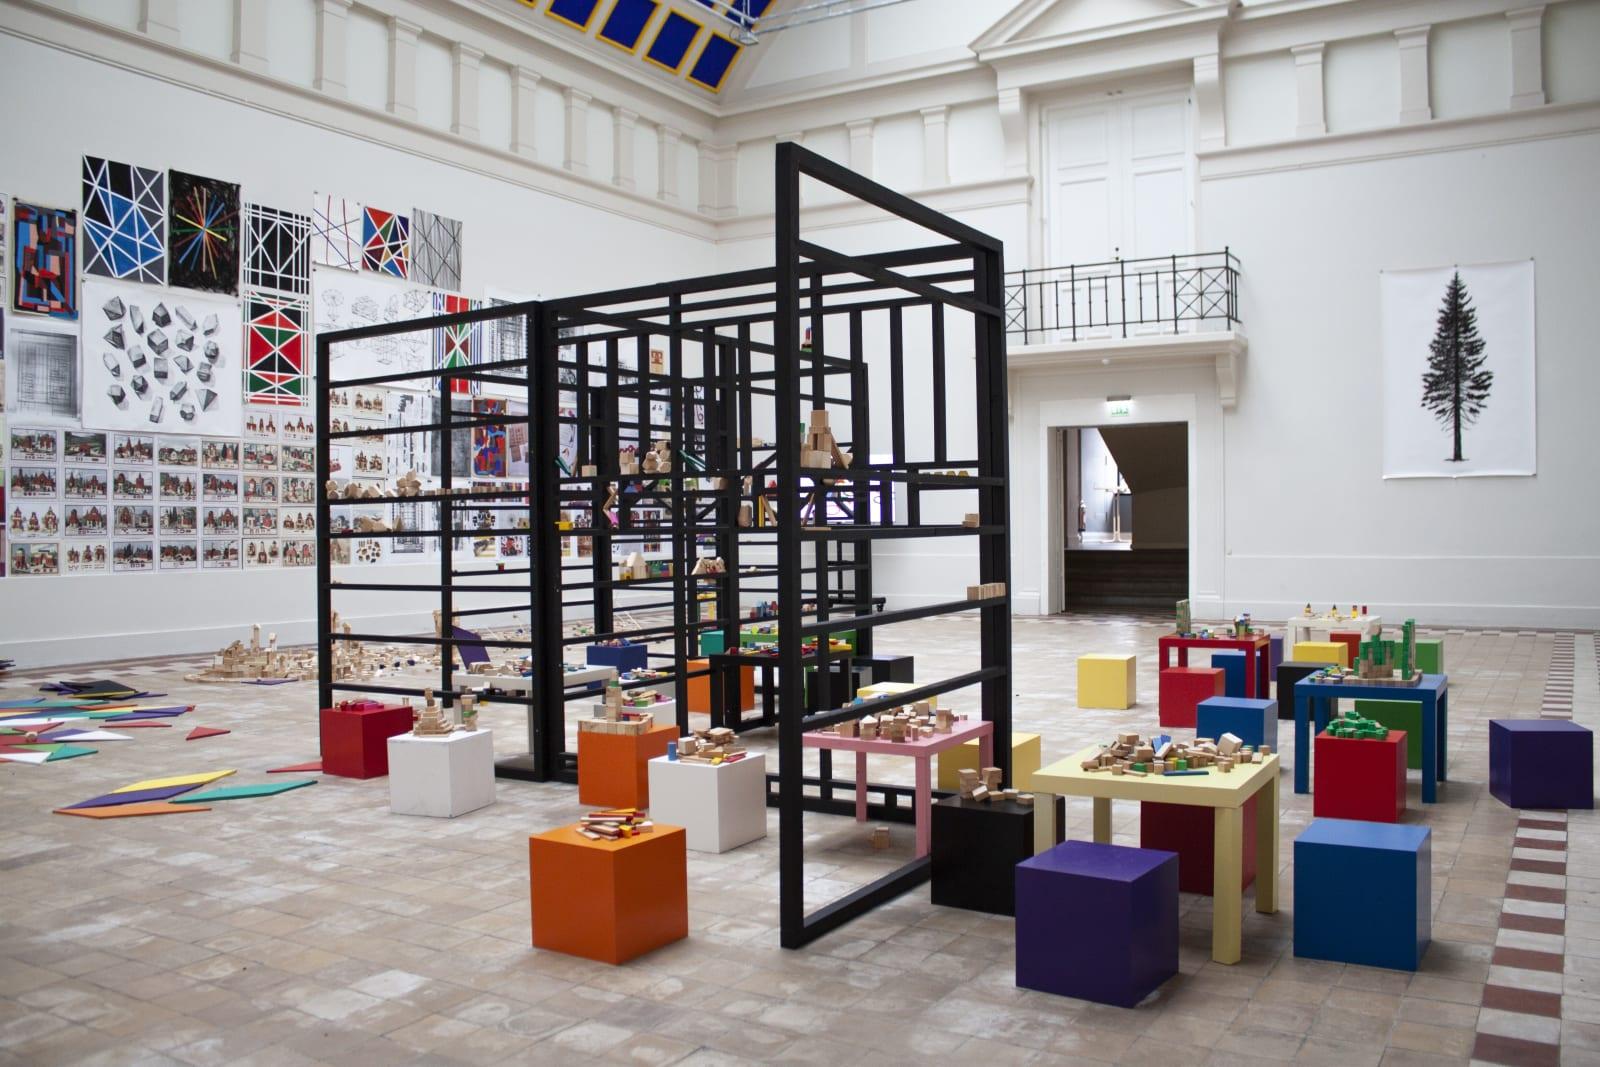 Fröbel Studio: Institut for Kreativitet, Fyns Kunstmuseum, 2019